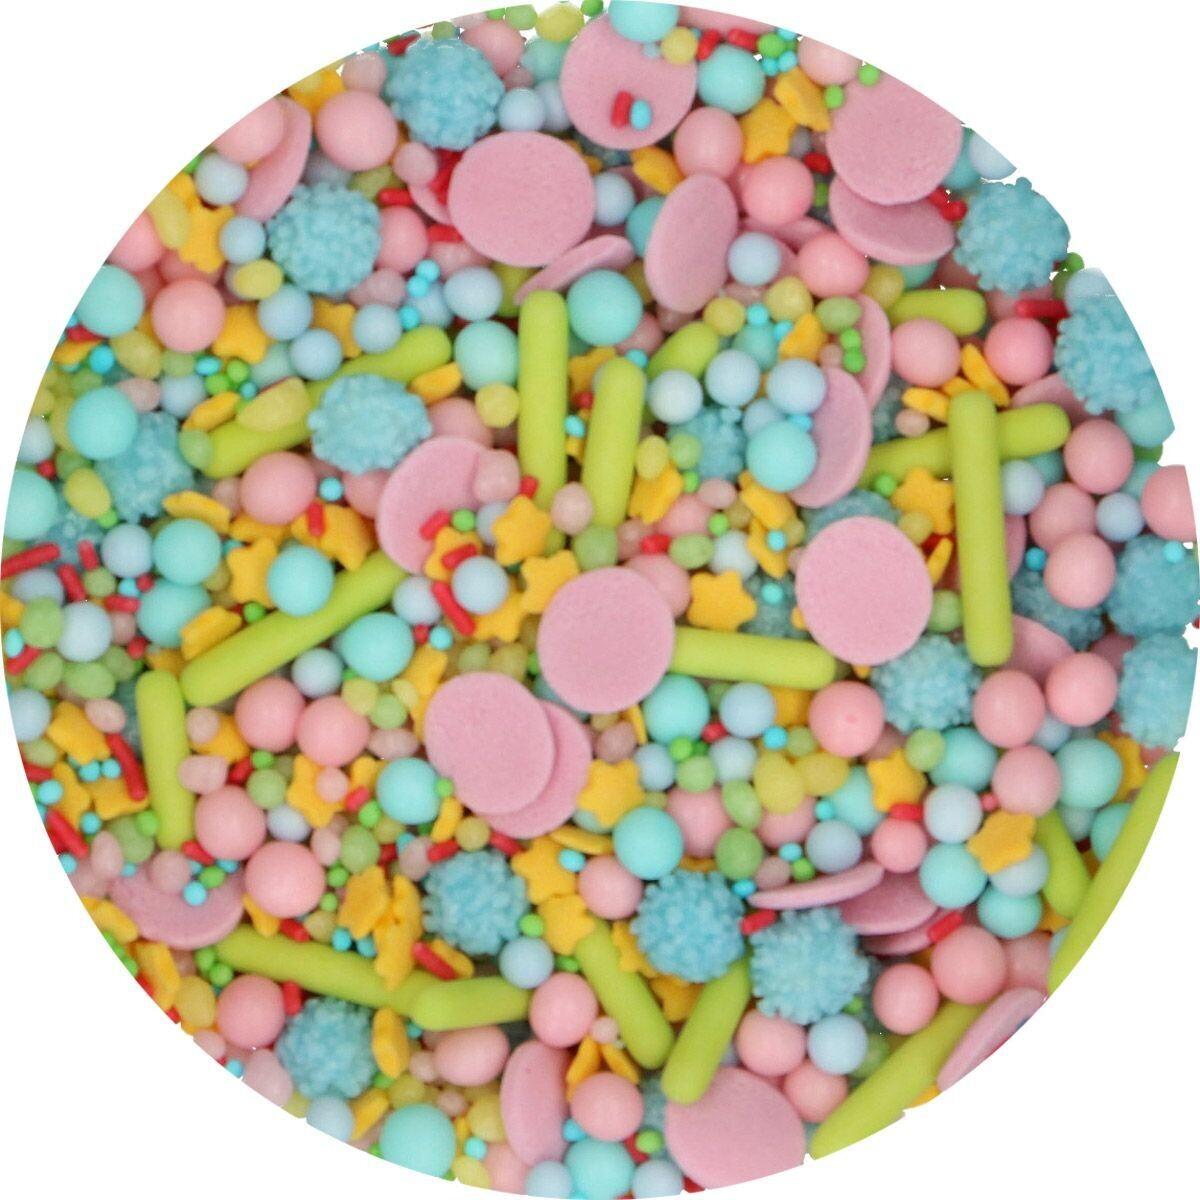 FunCakes Sprinkle Mix 65γρ -HAPPY MEDLEY - Μείγμα  Ζαχαρωτών σε Παστέλ Αποχρώσεις